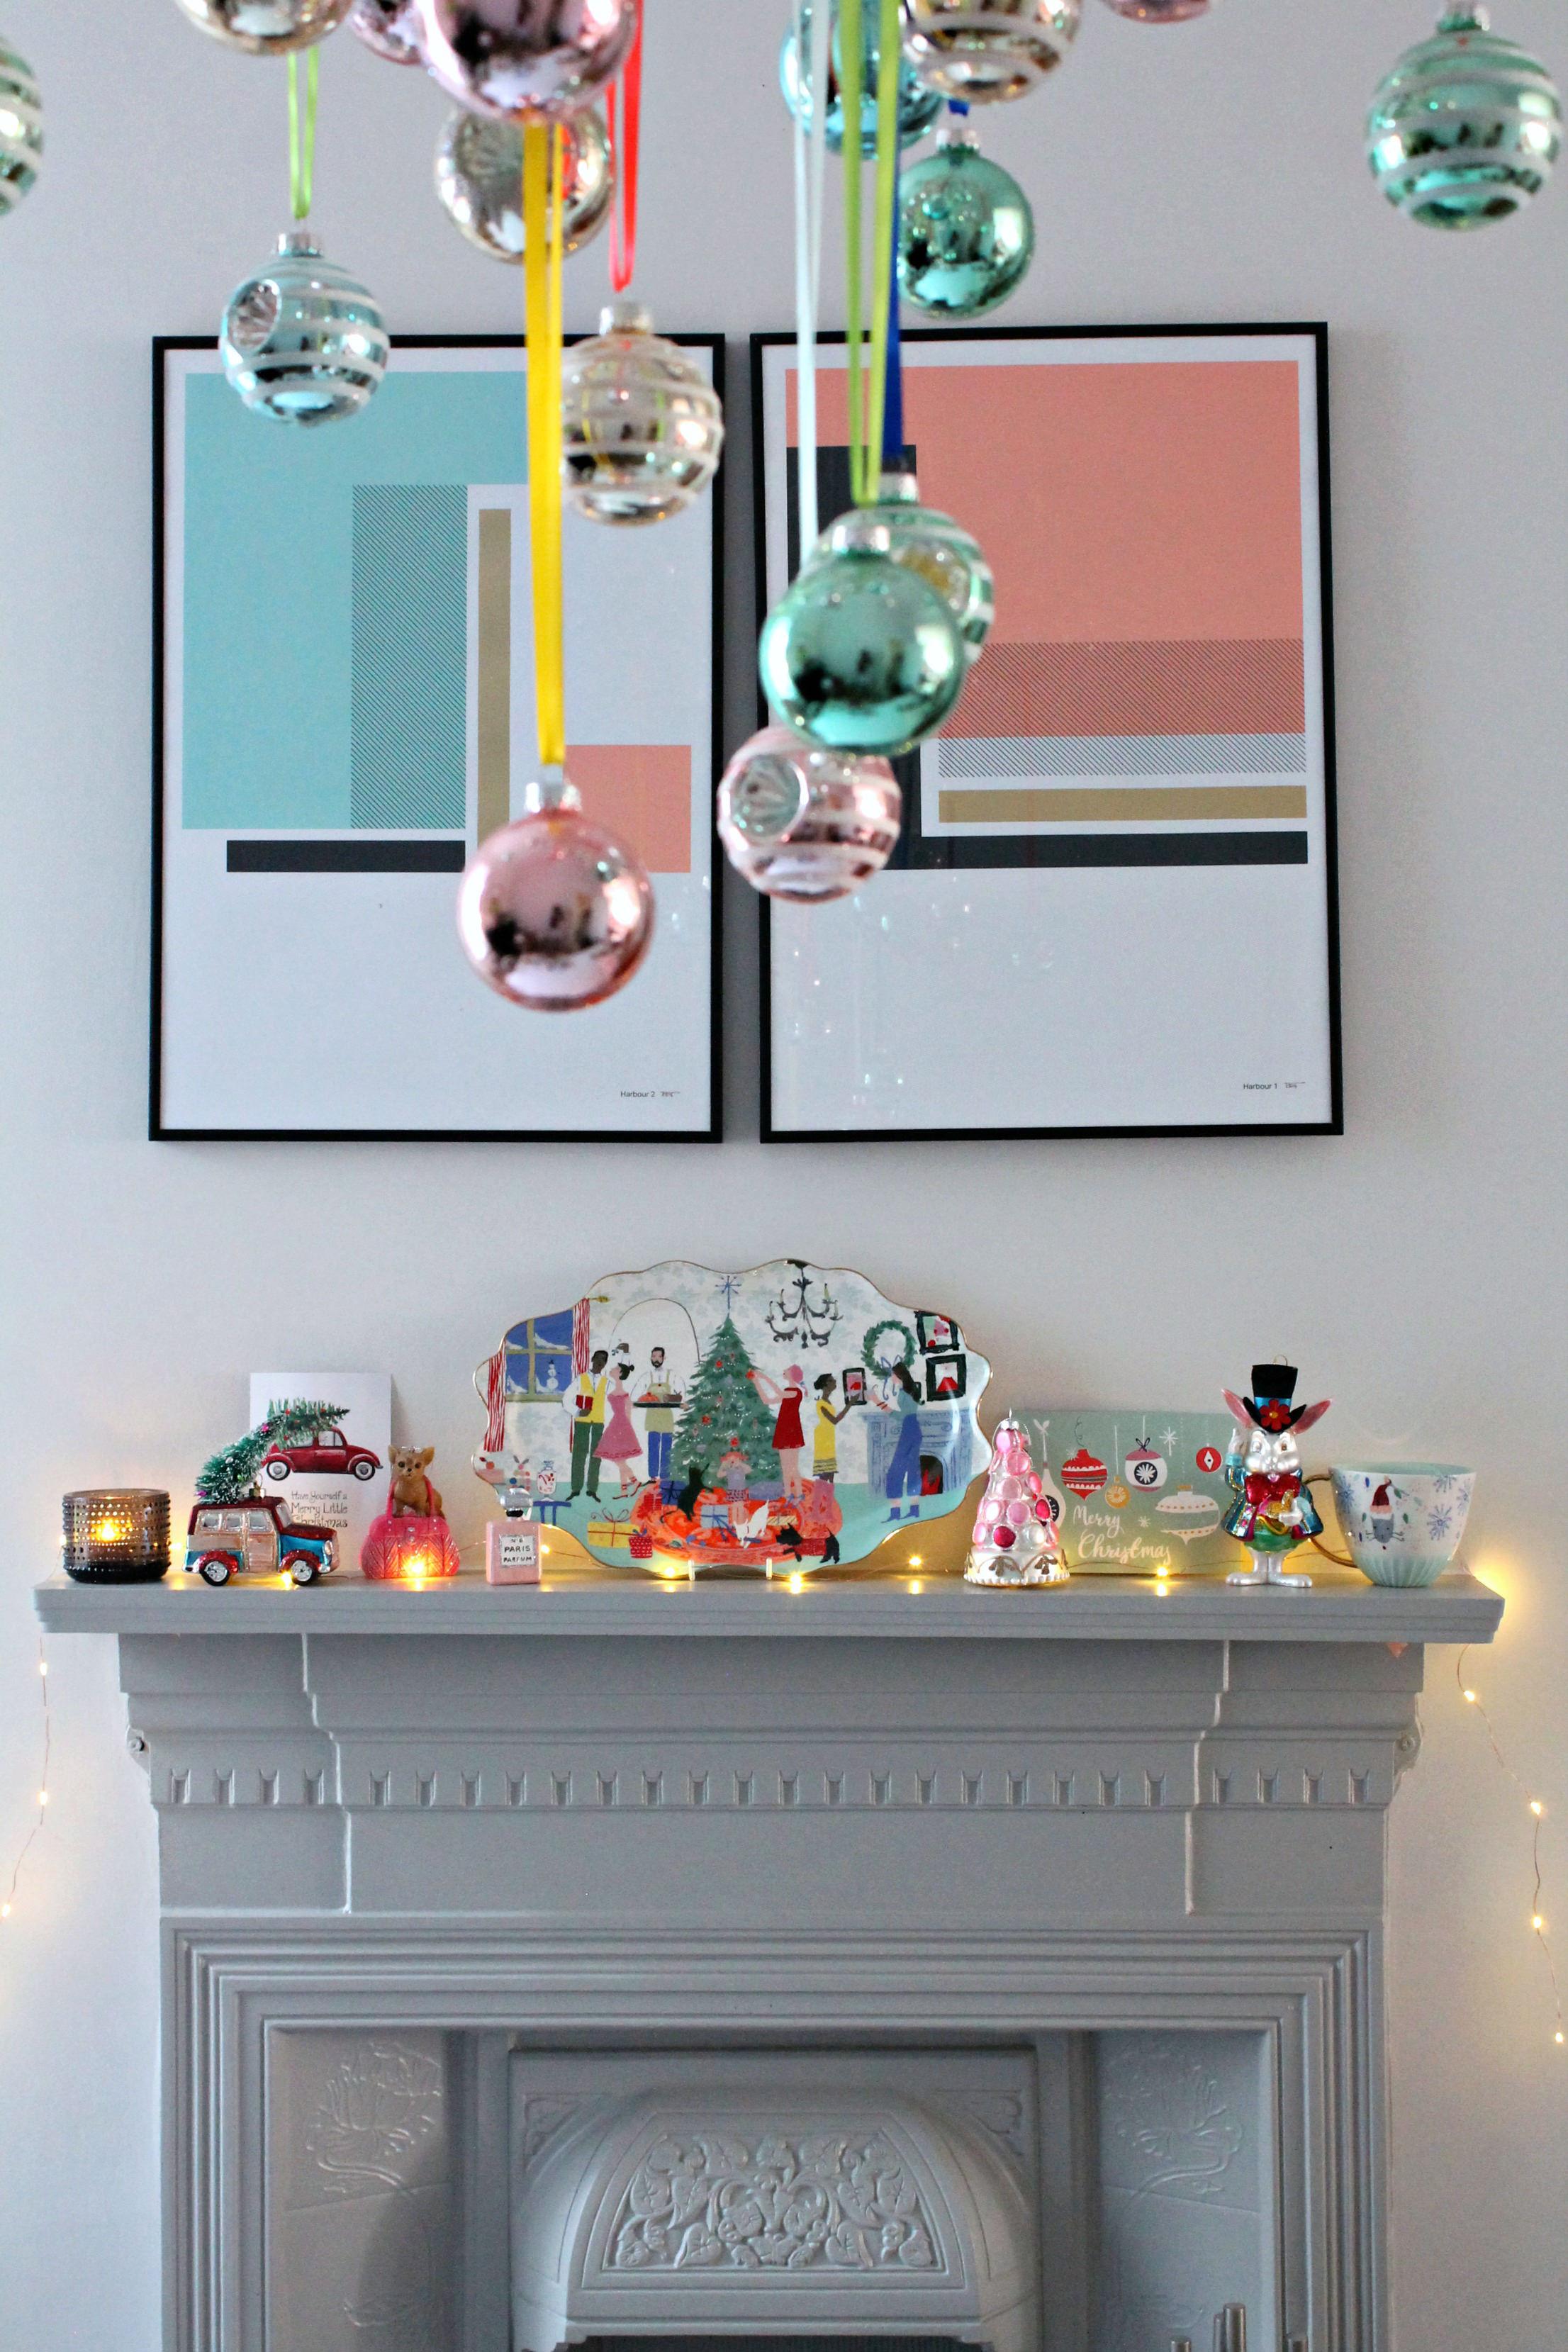 Littlebigbell Goodwill Belgium Christmas Decorations At